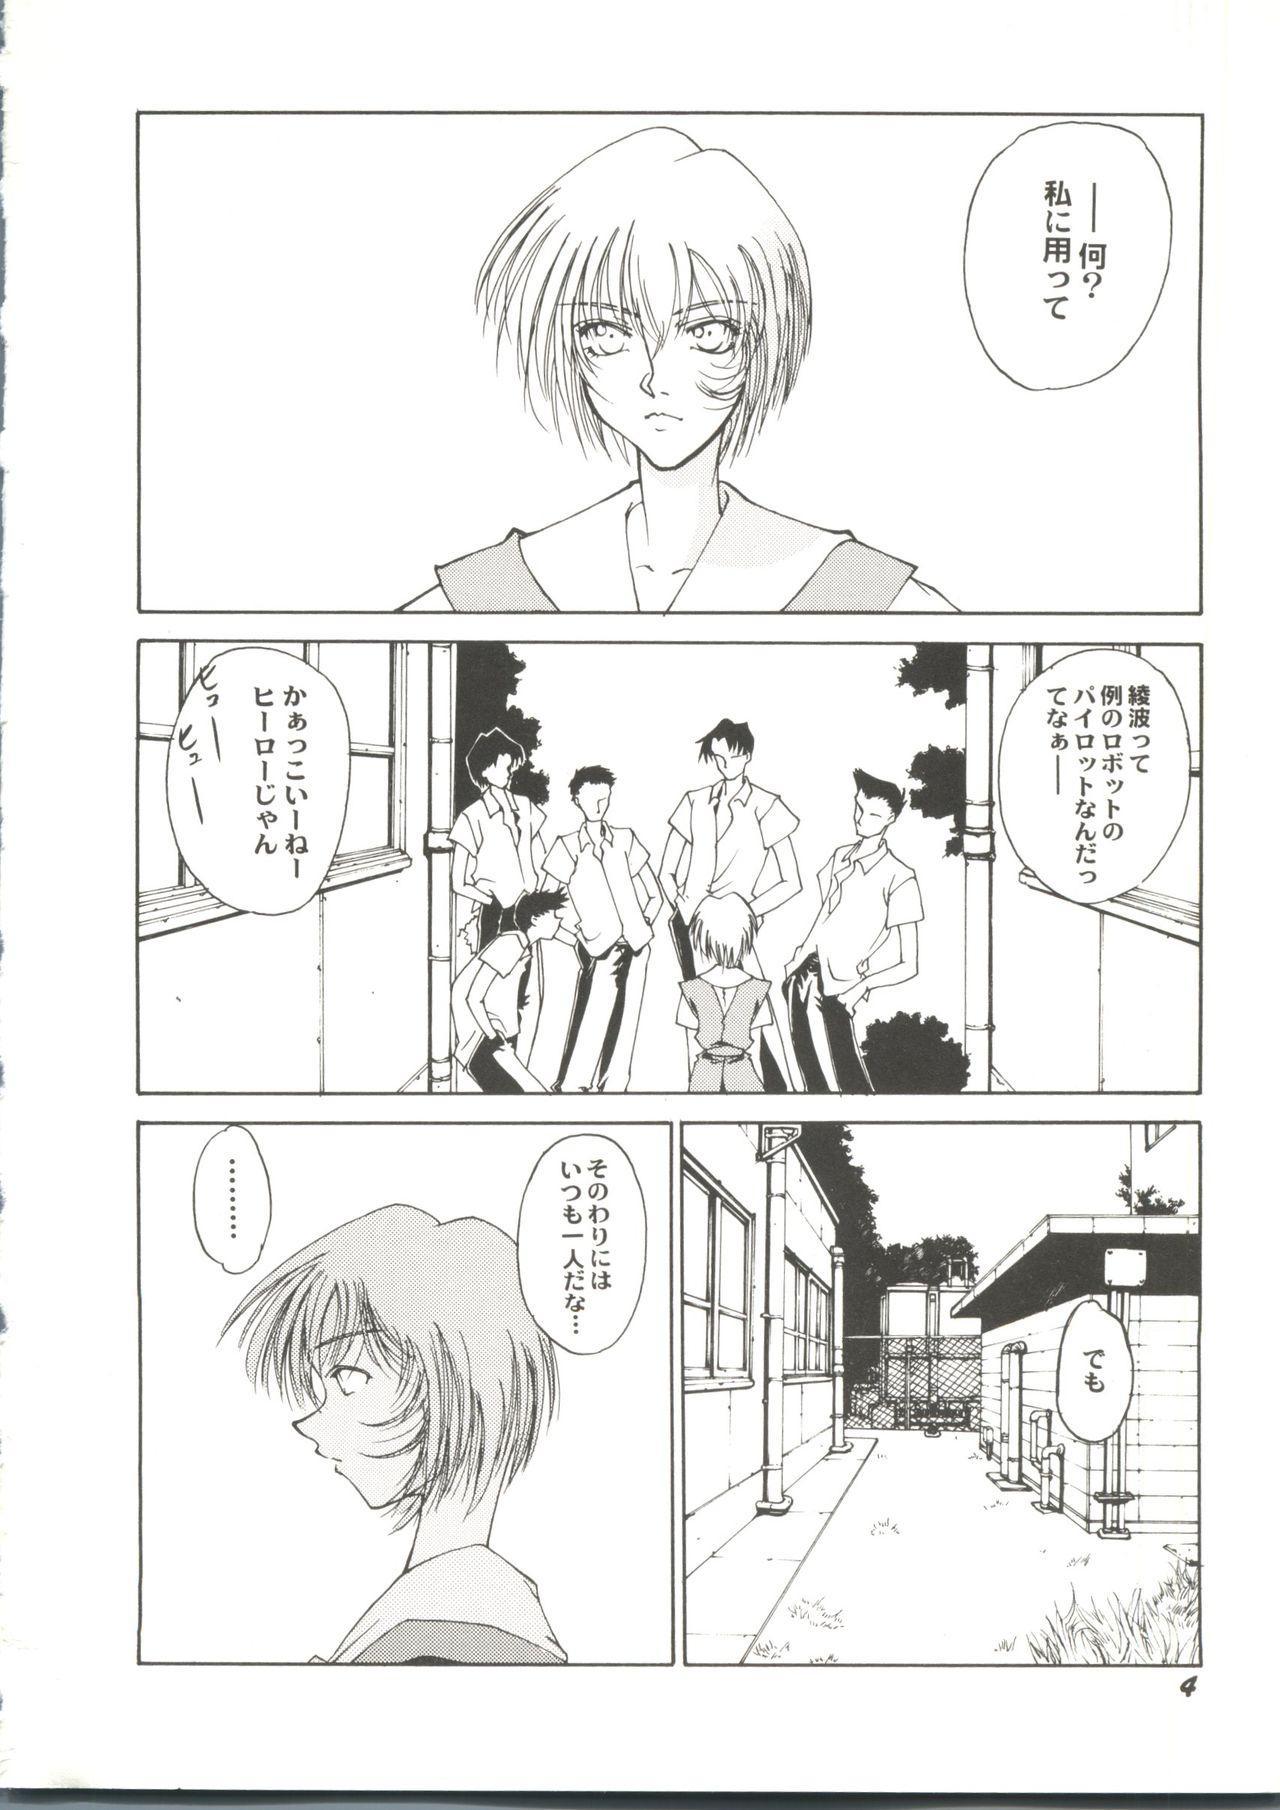 Bishoujo Doujin Peach Club - Pretty Gal's Fanzine Peach Club 9 5